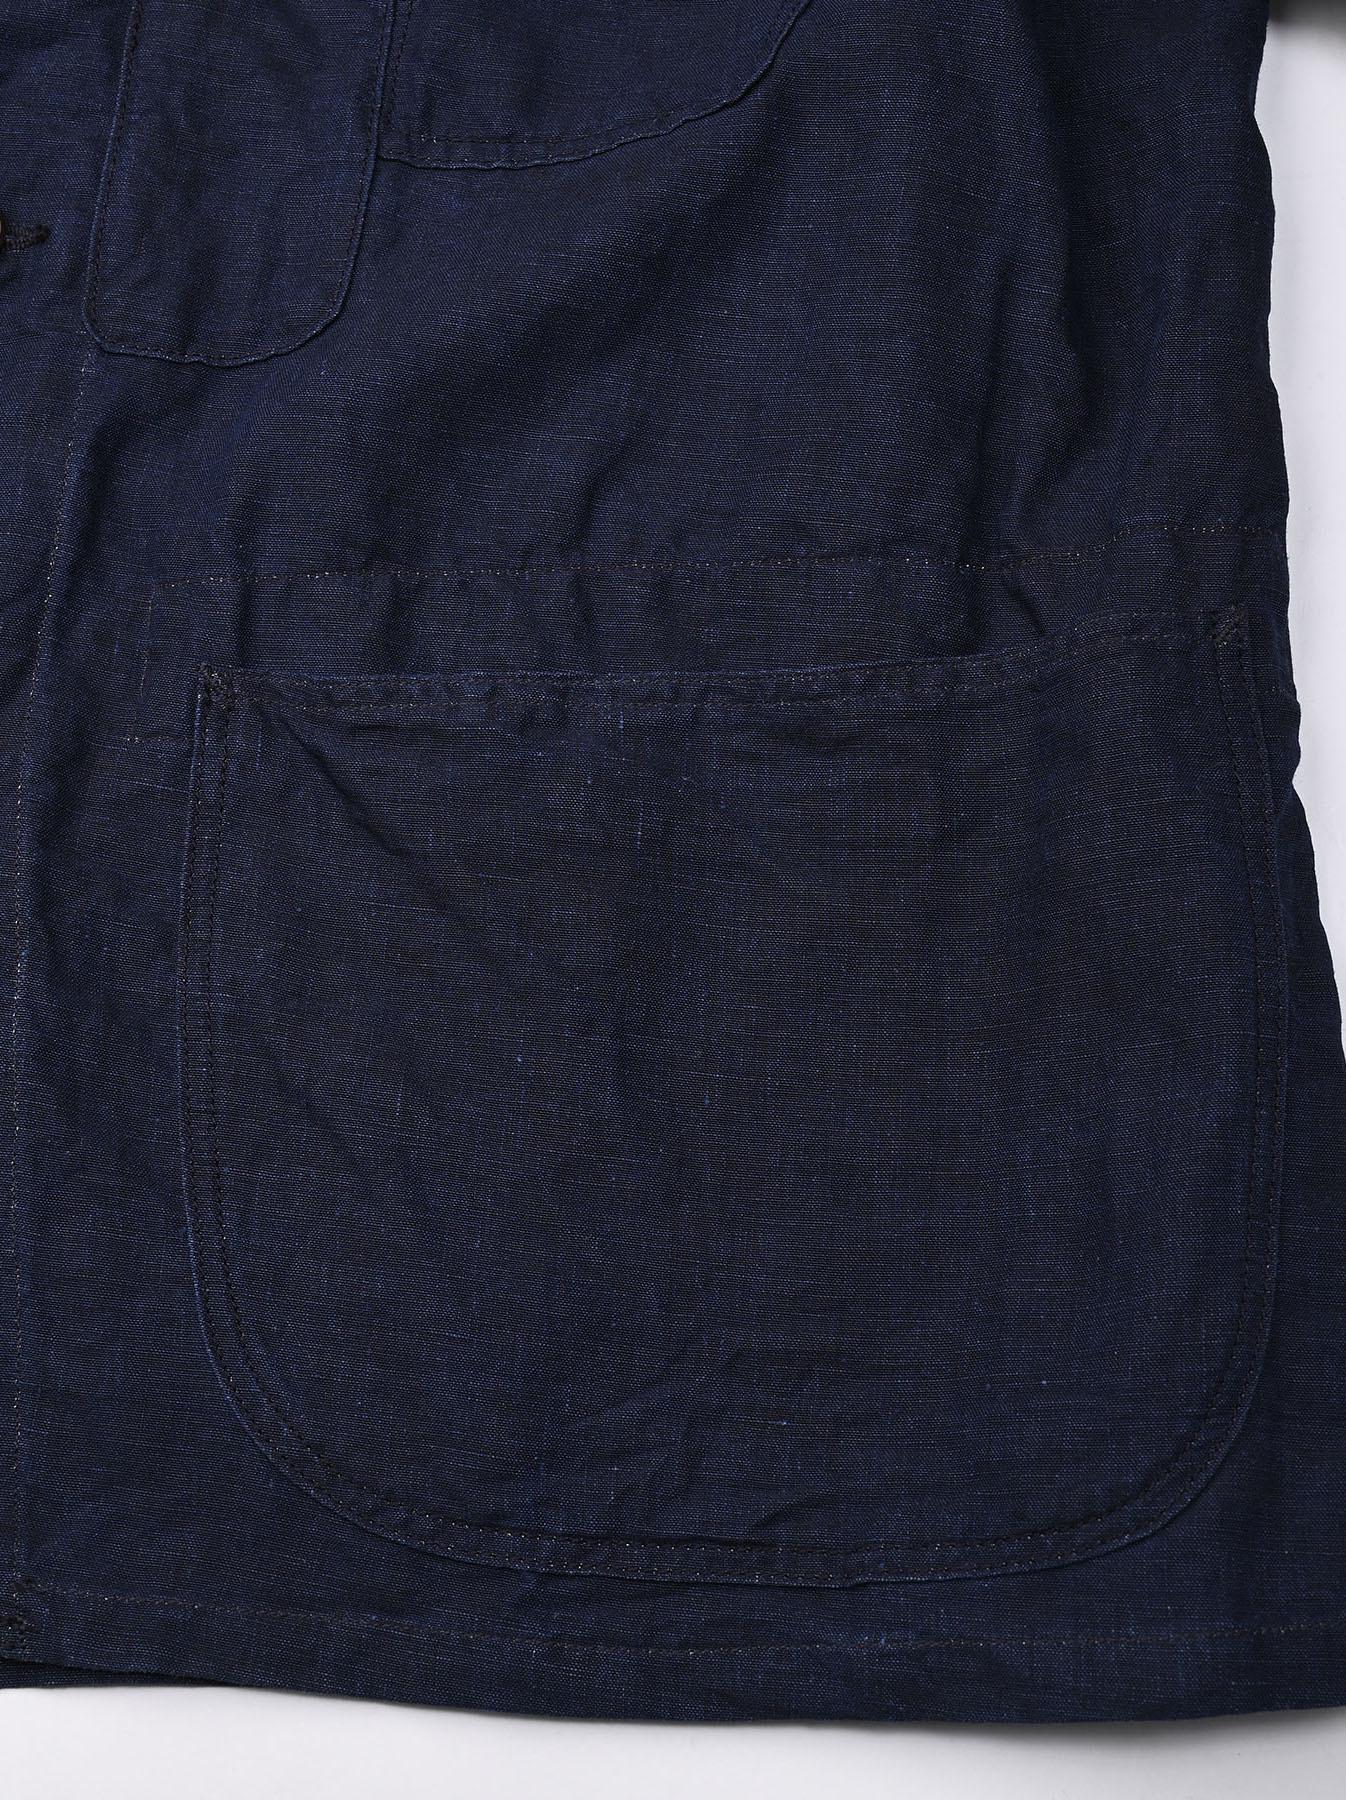 Indigo Linen 908 V-neck Coverall (0421)-10